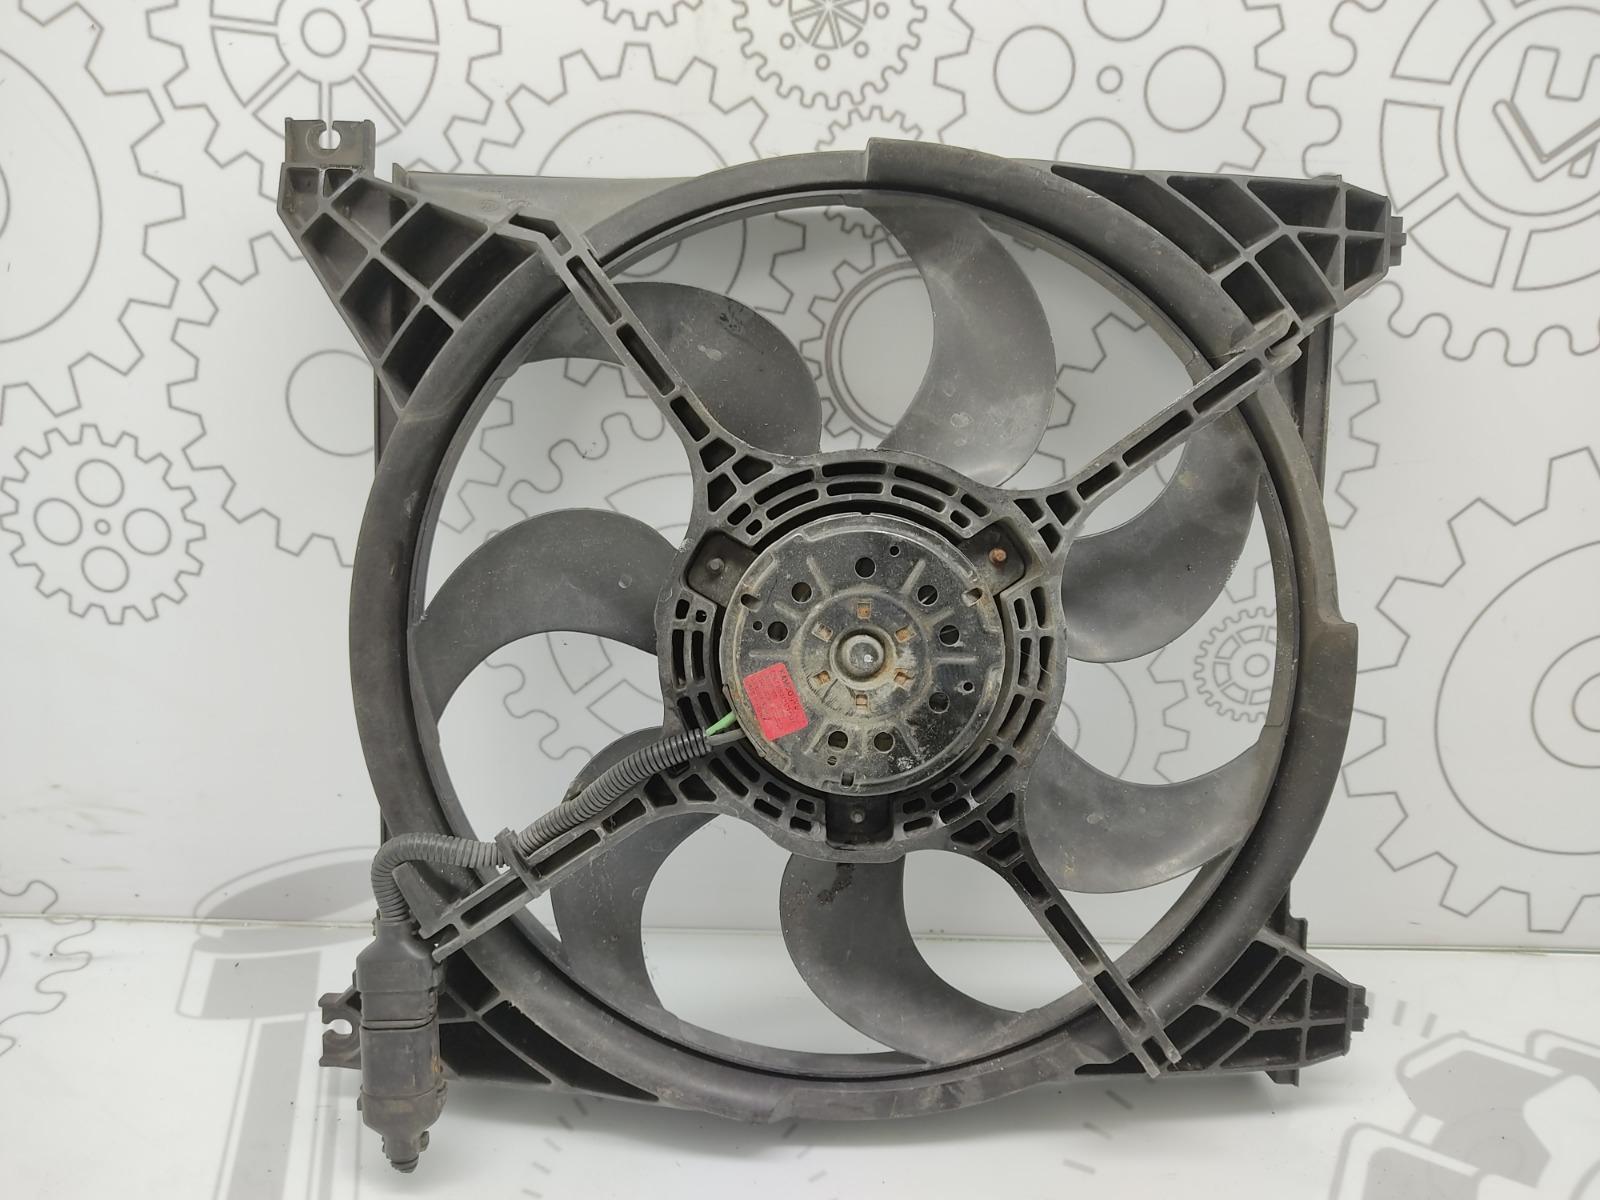 Вентилятор радиатора Hyundai Santa Fe 2.0 CRDI 2002 (б/у)